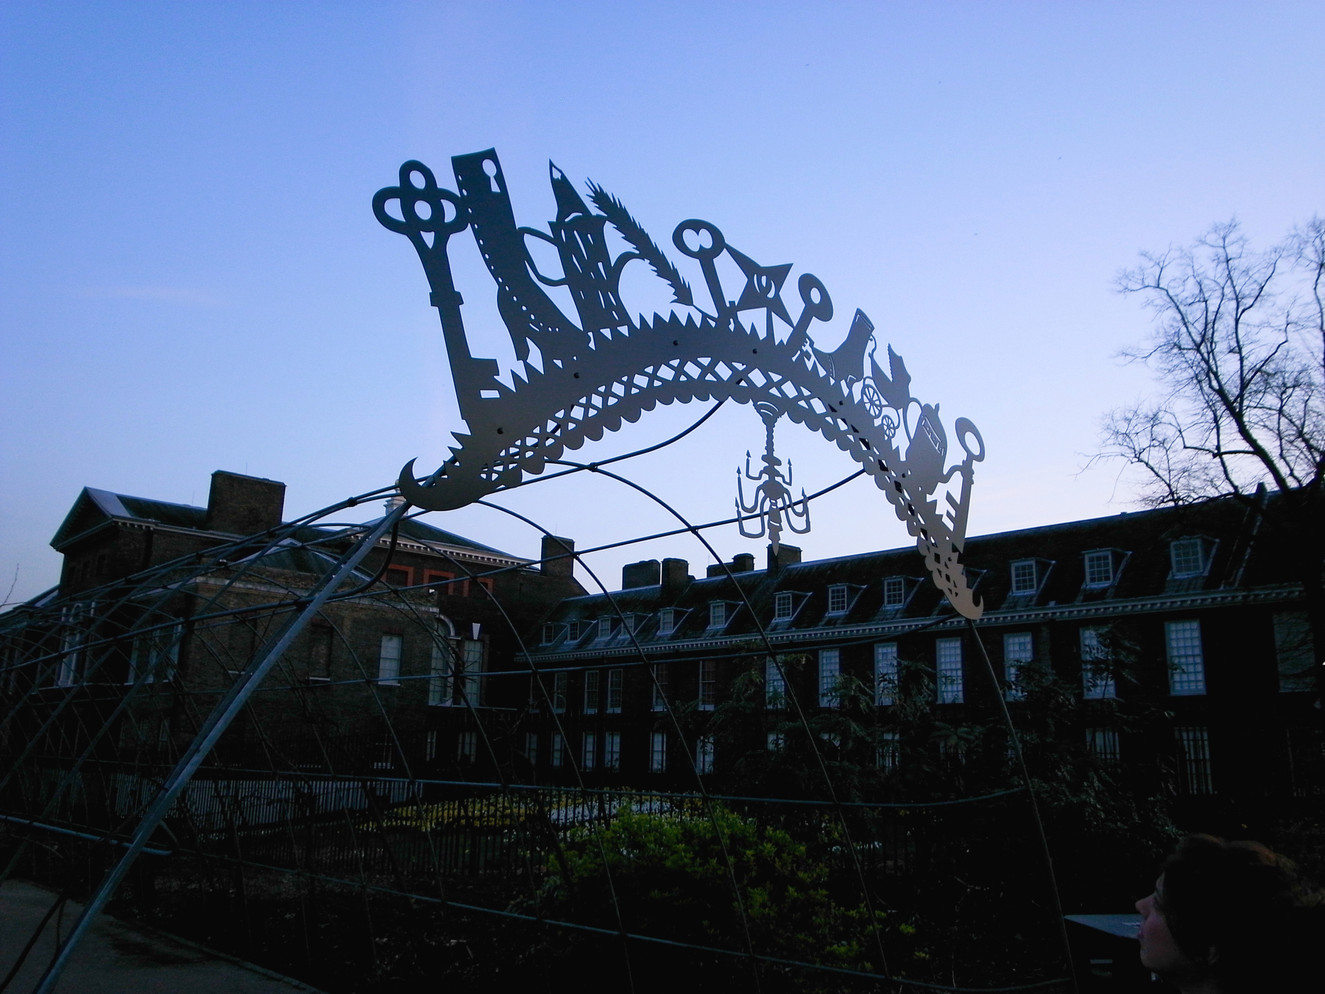 Sunken Gardens/Kensigton Palace